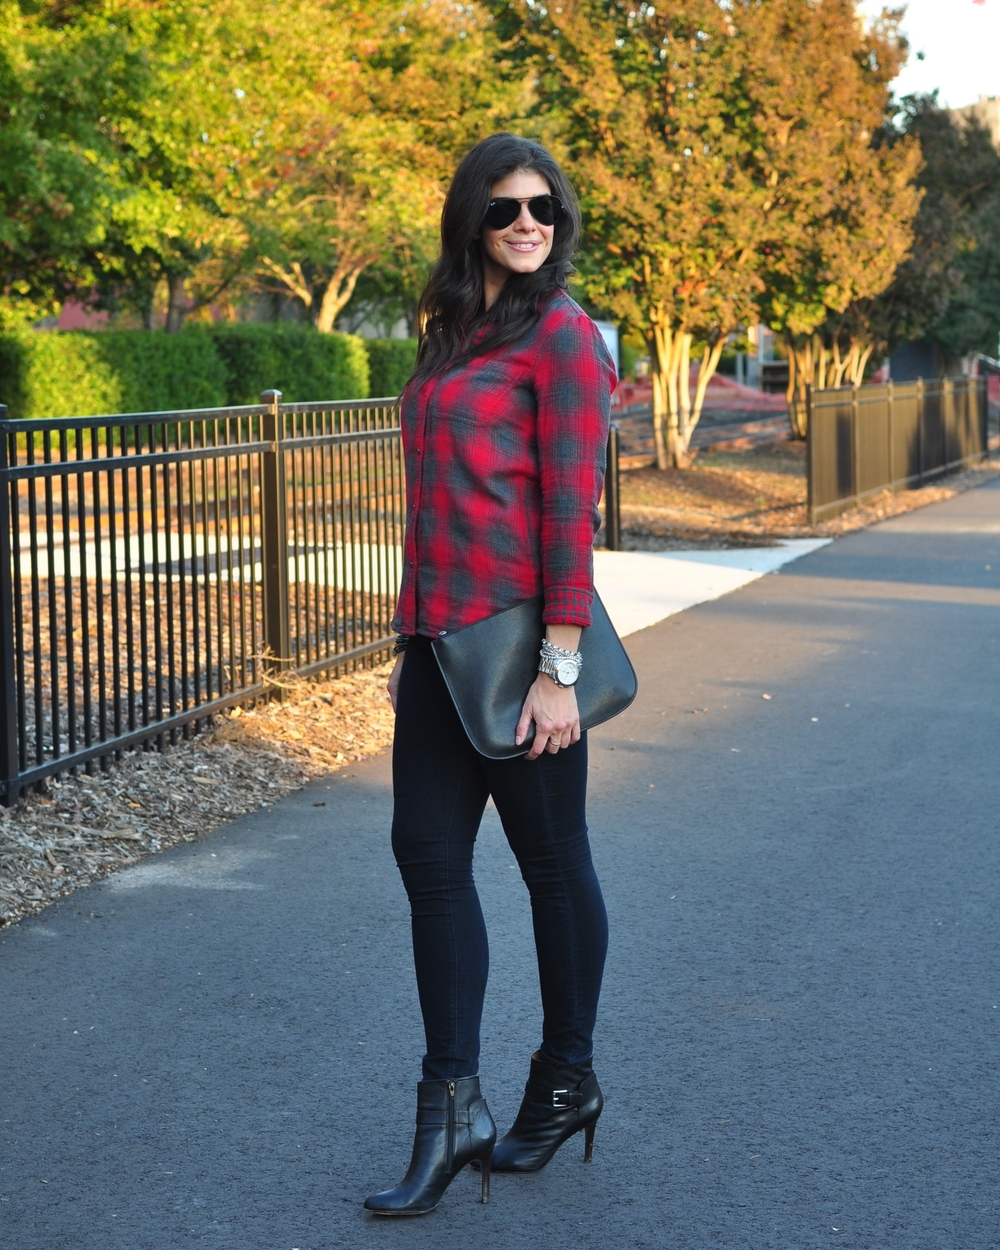 LaurenSchwaiger-Life-Style-Blog-Madewell-Plaid-Fall-Street-Style.jpg